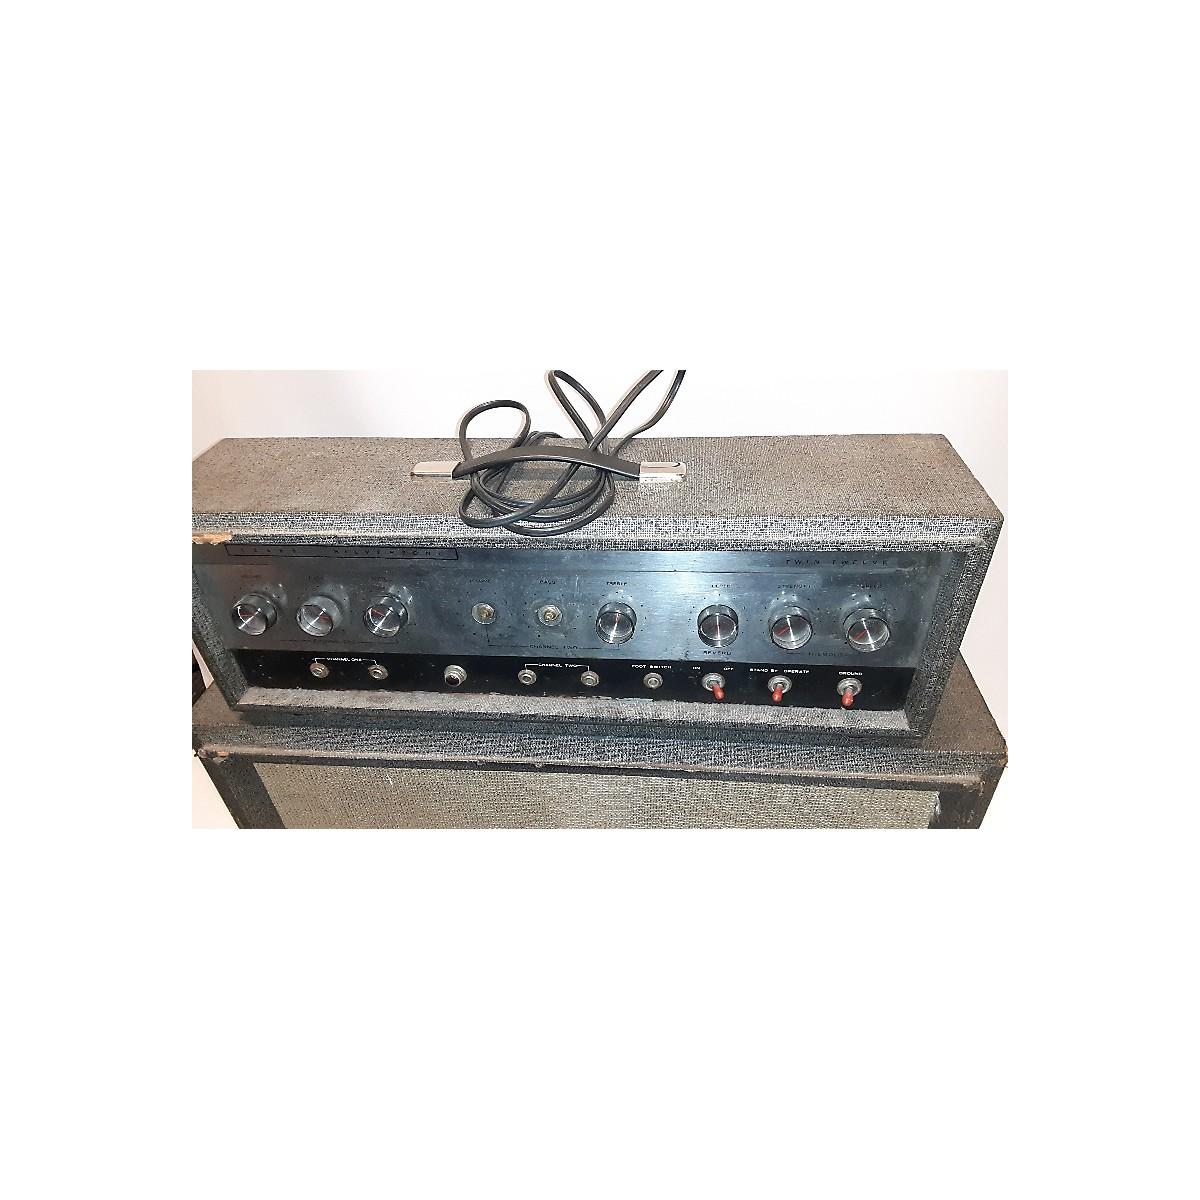 Silvertone 1966 Model 1484 Twin Twelve W/Cab Solid State Guitar Amp Head